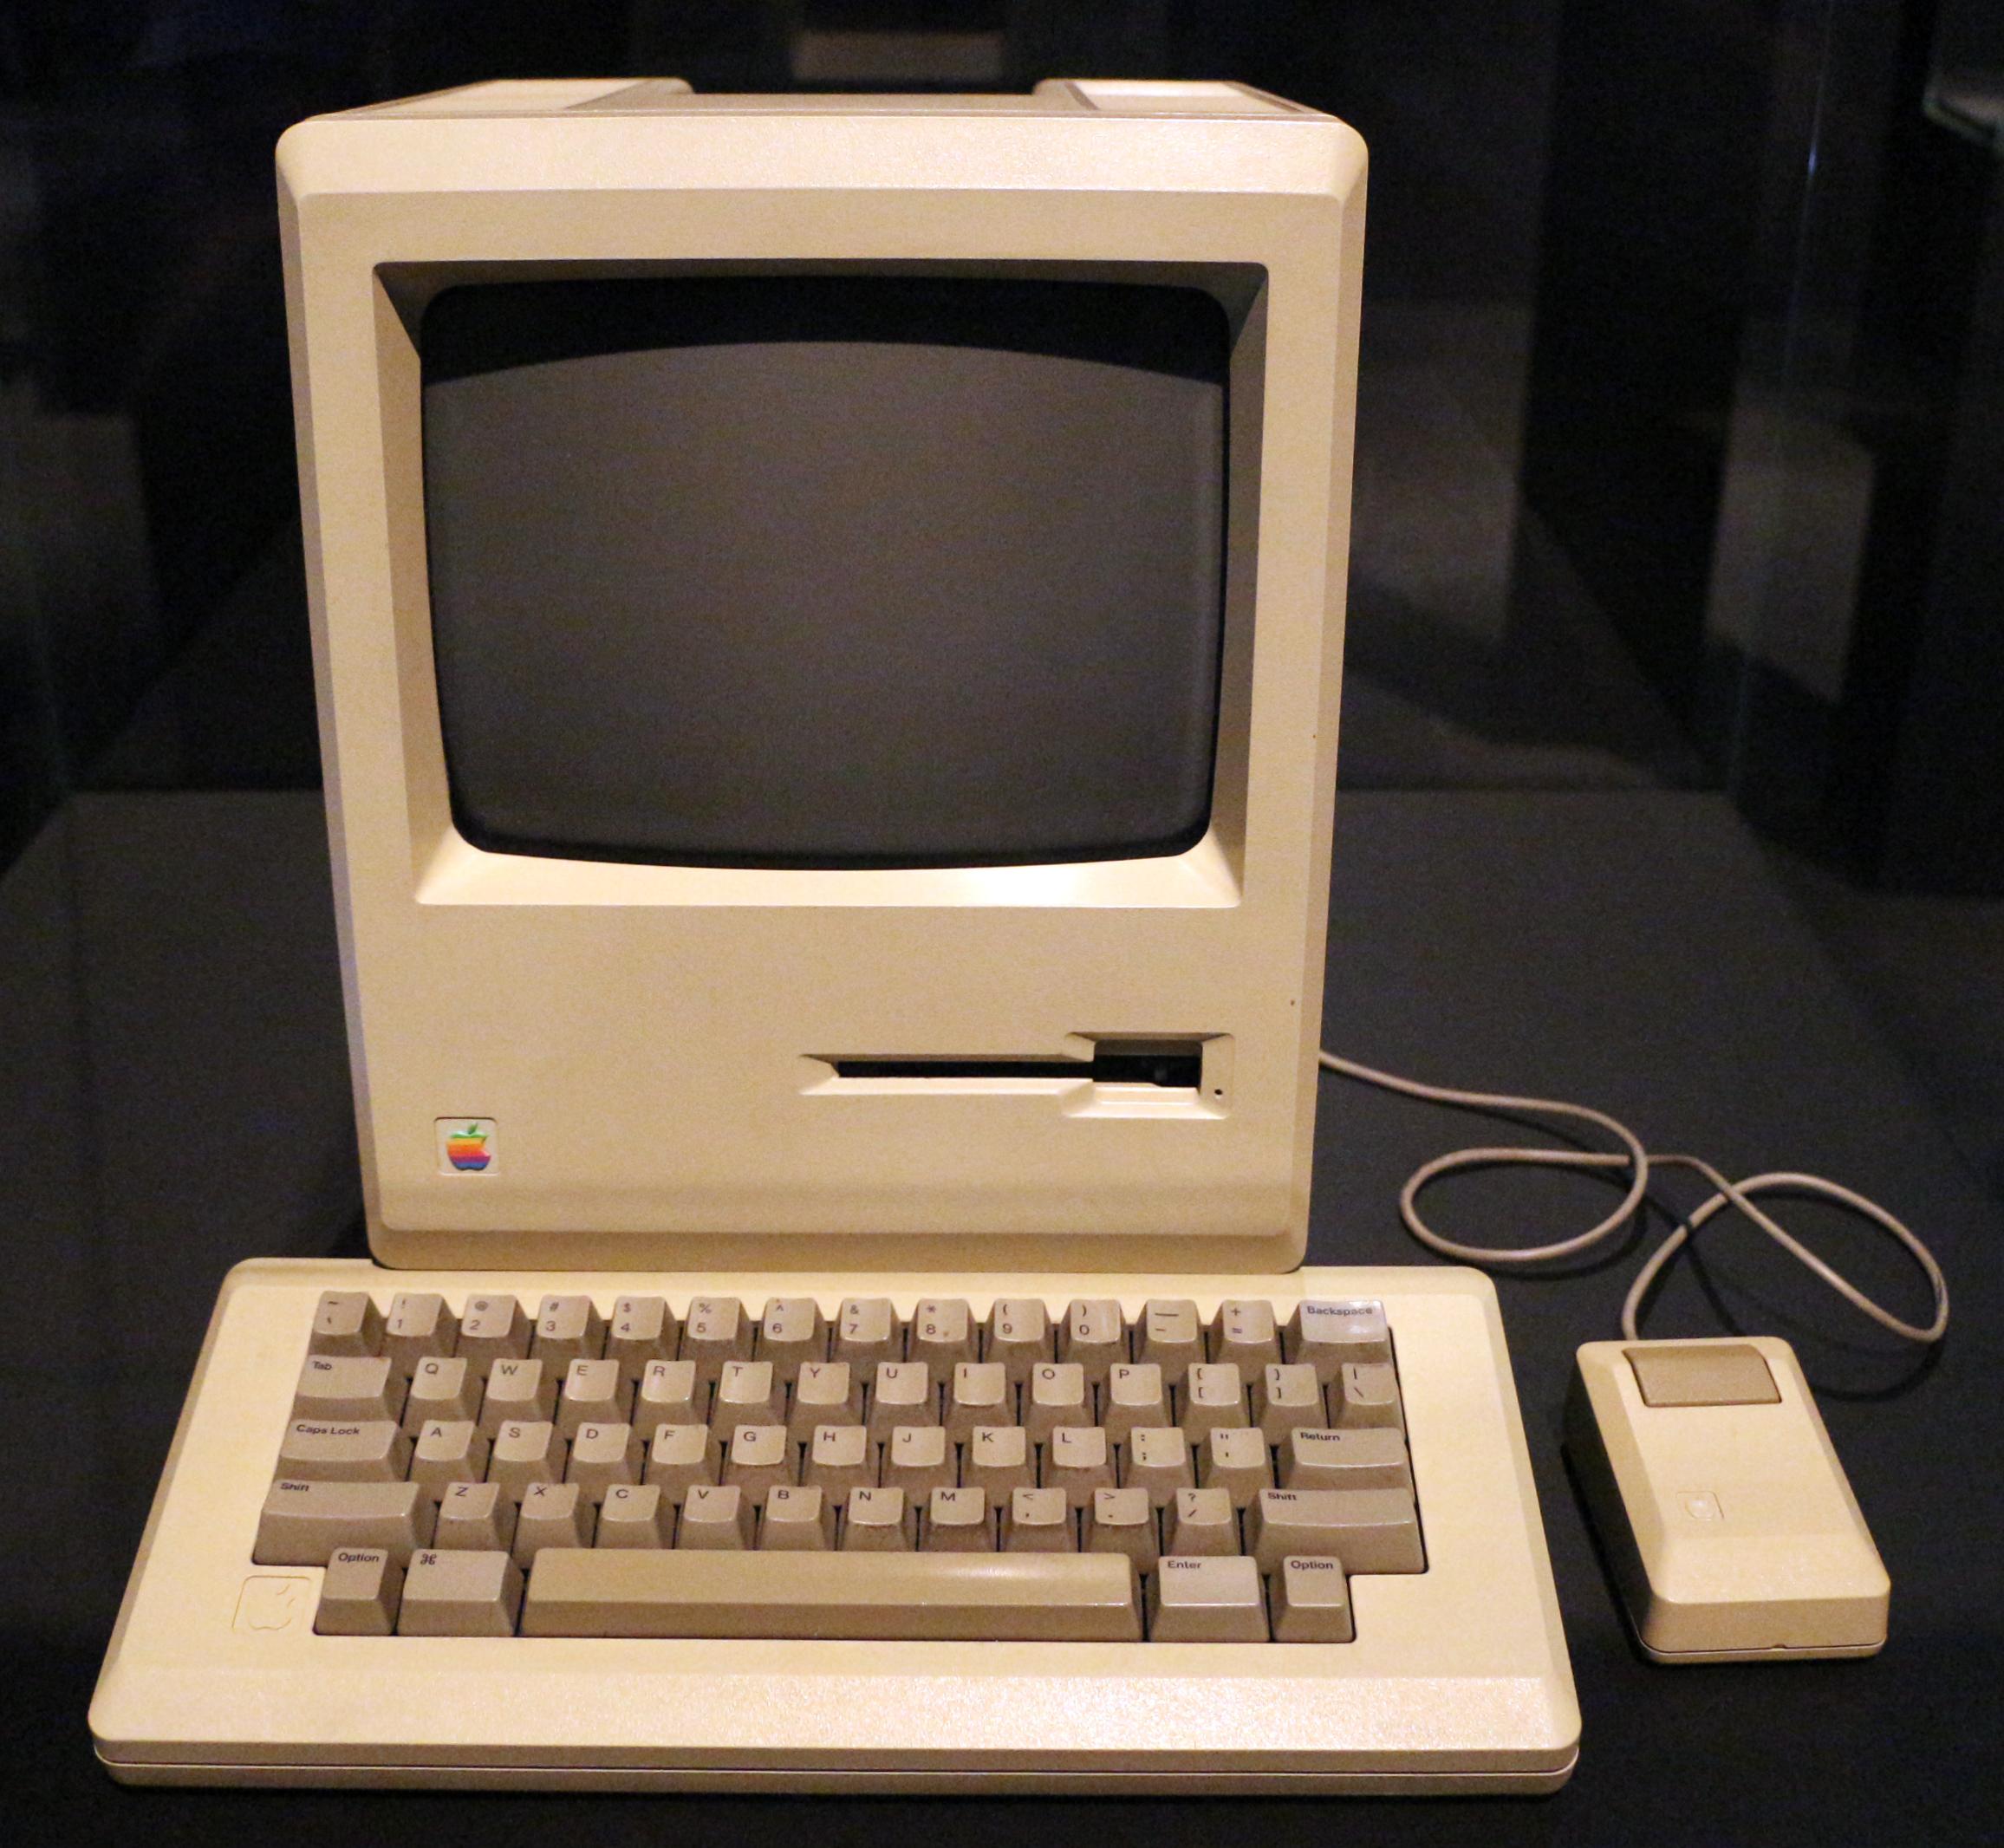 Computer_macintosh_128k,_1984_(alla_about_apple_onlus).jpg